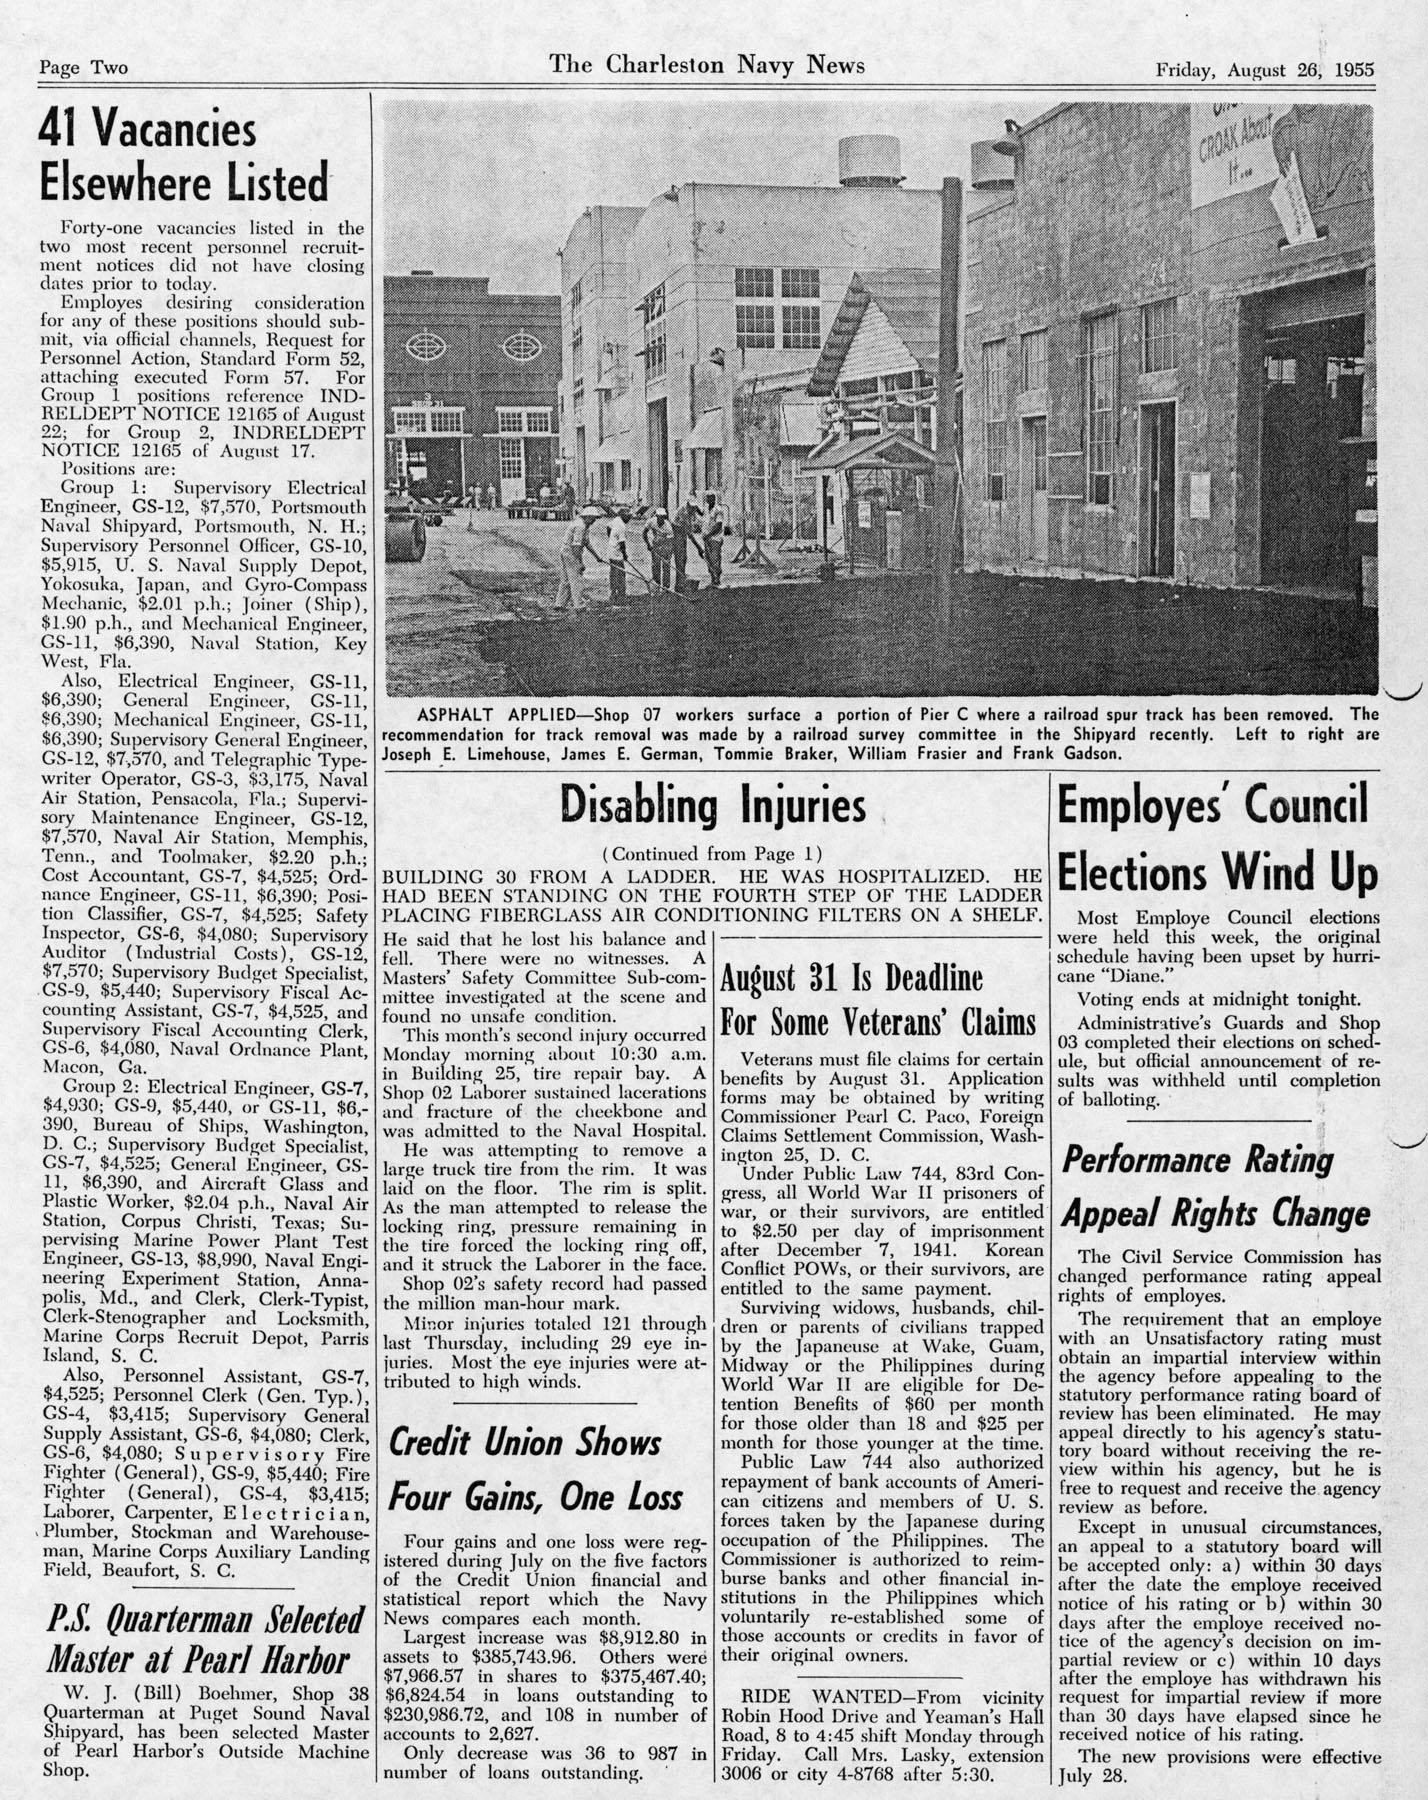 The Charleston Navy News, Volume 14, Edition 3, page ii